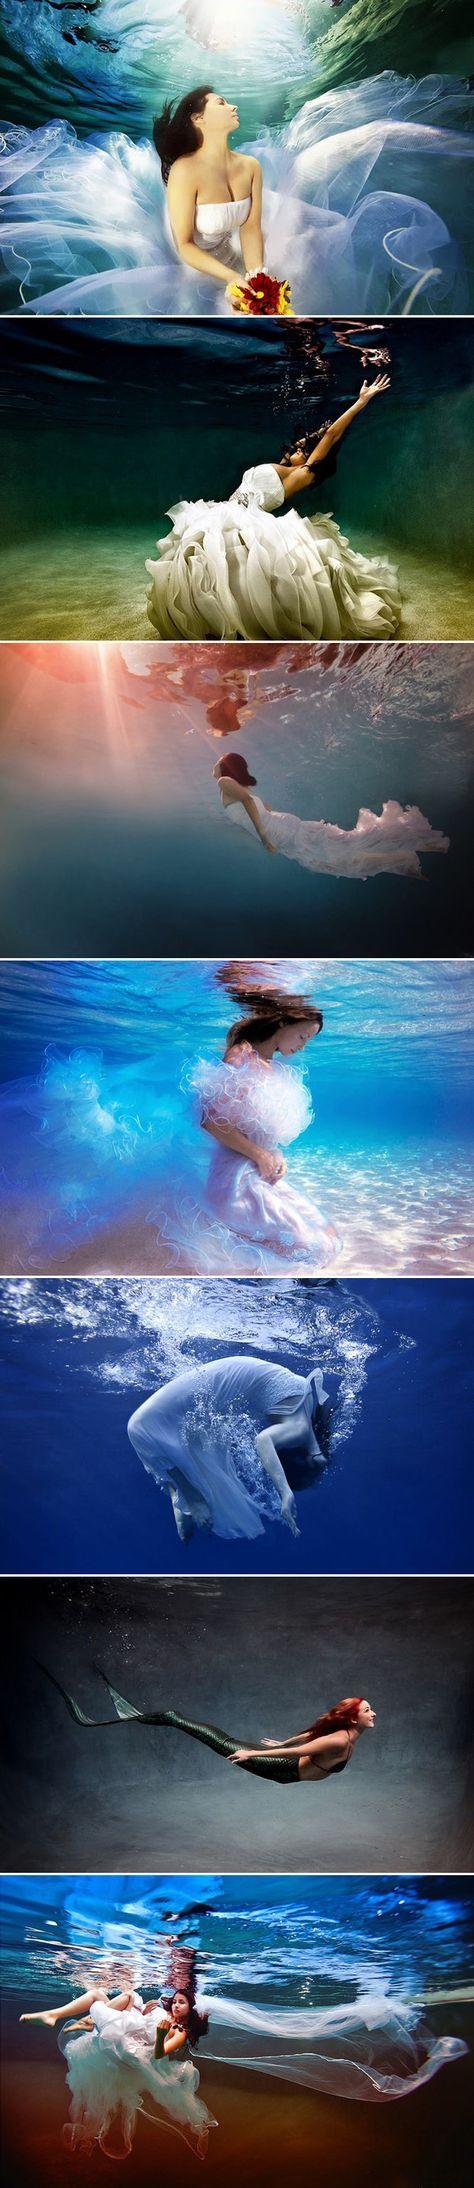 Underwater Brides Pictures